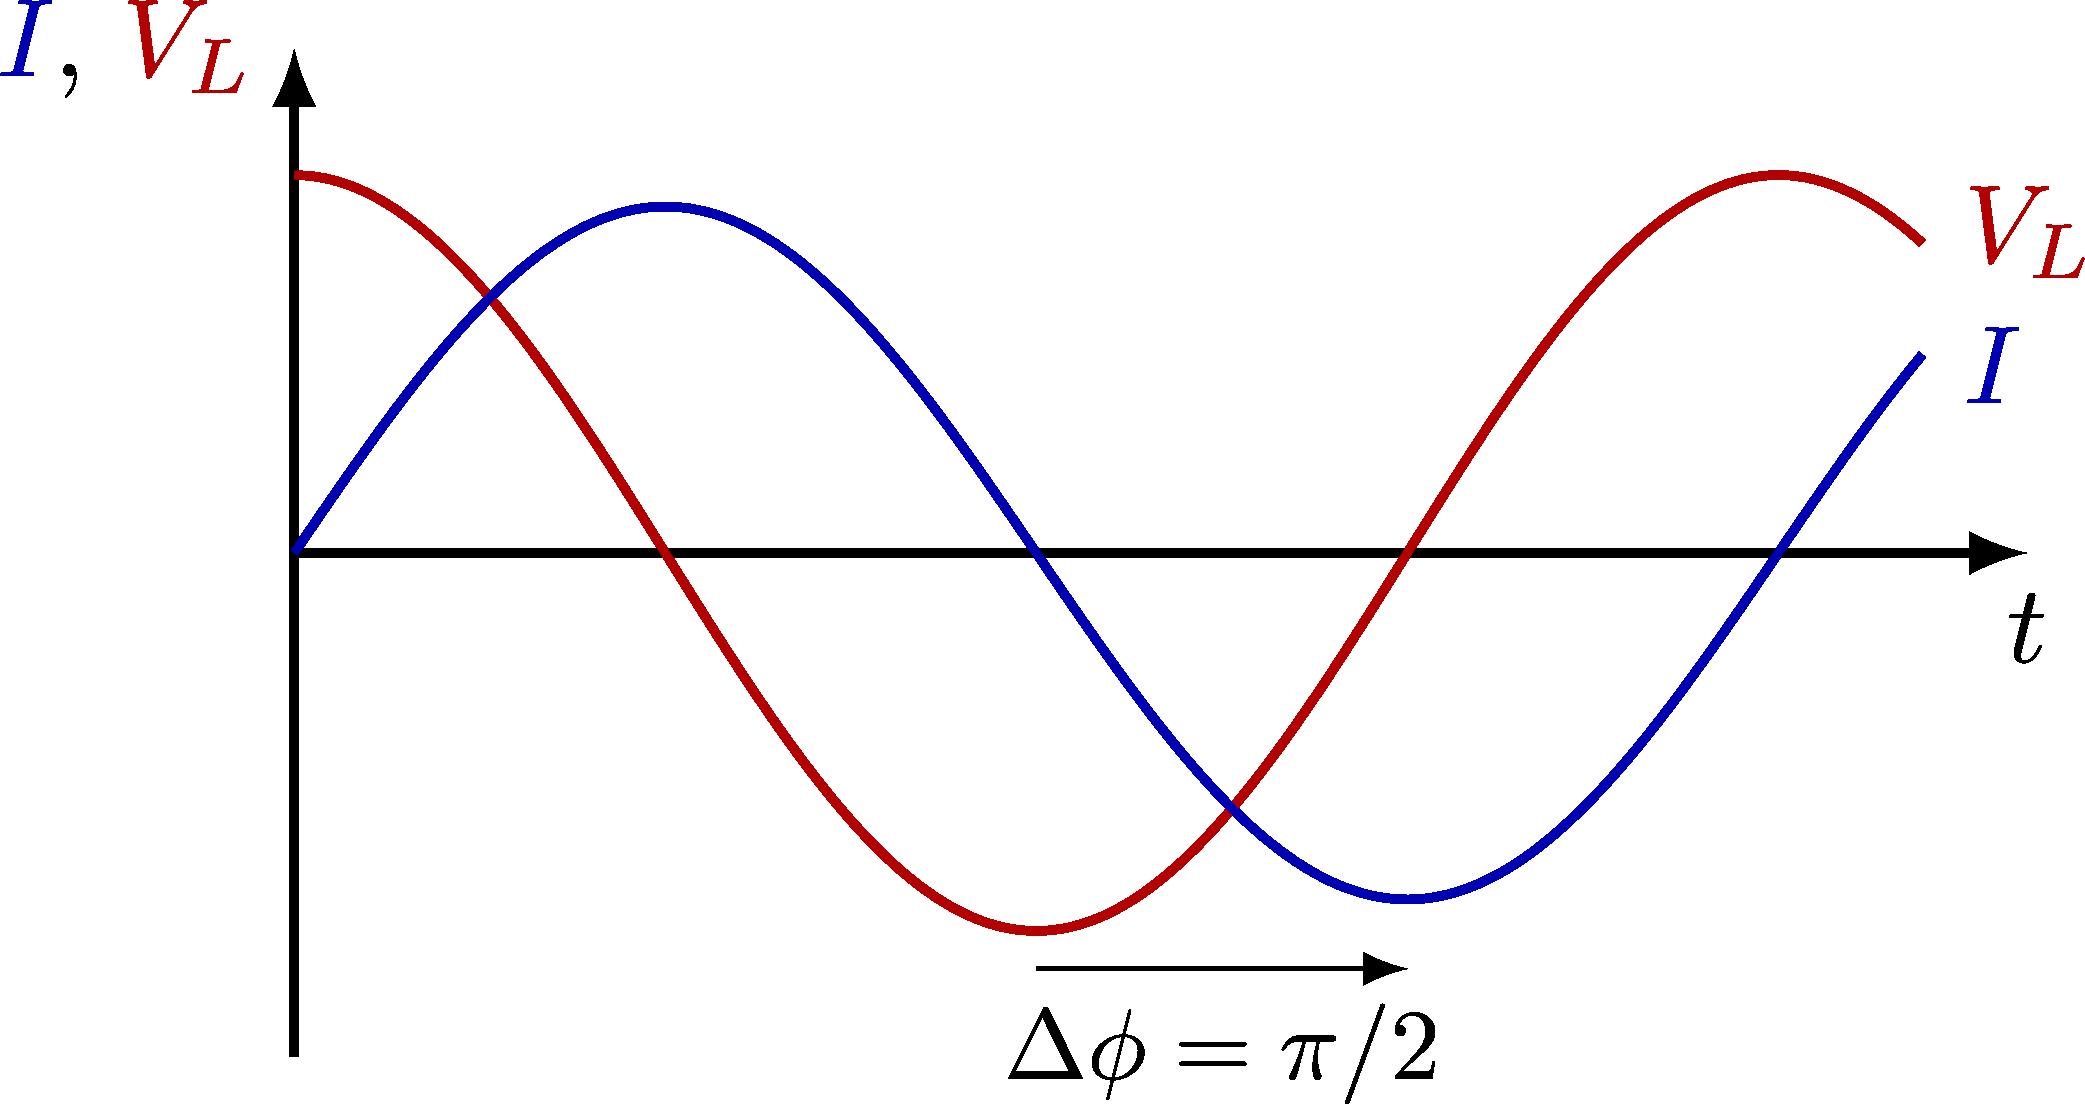 electric_circuit_ac_plots-003.png